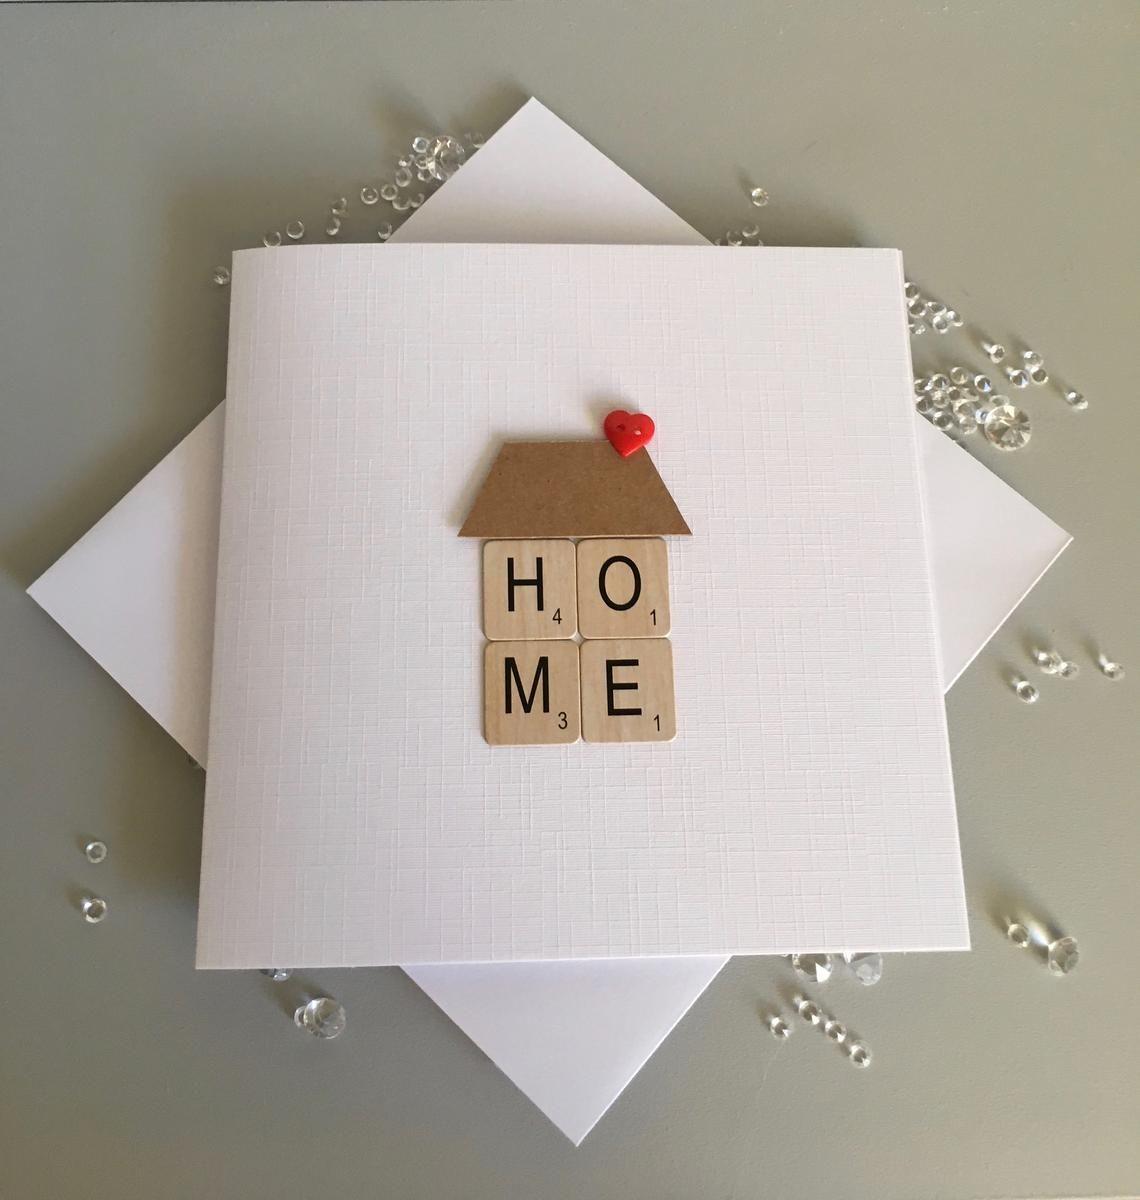 Handmade New Home Card Moving House House Warming Good Luck In Your New Home New House New Home Welcome Home Cards New Home Cards Moving House Card